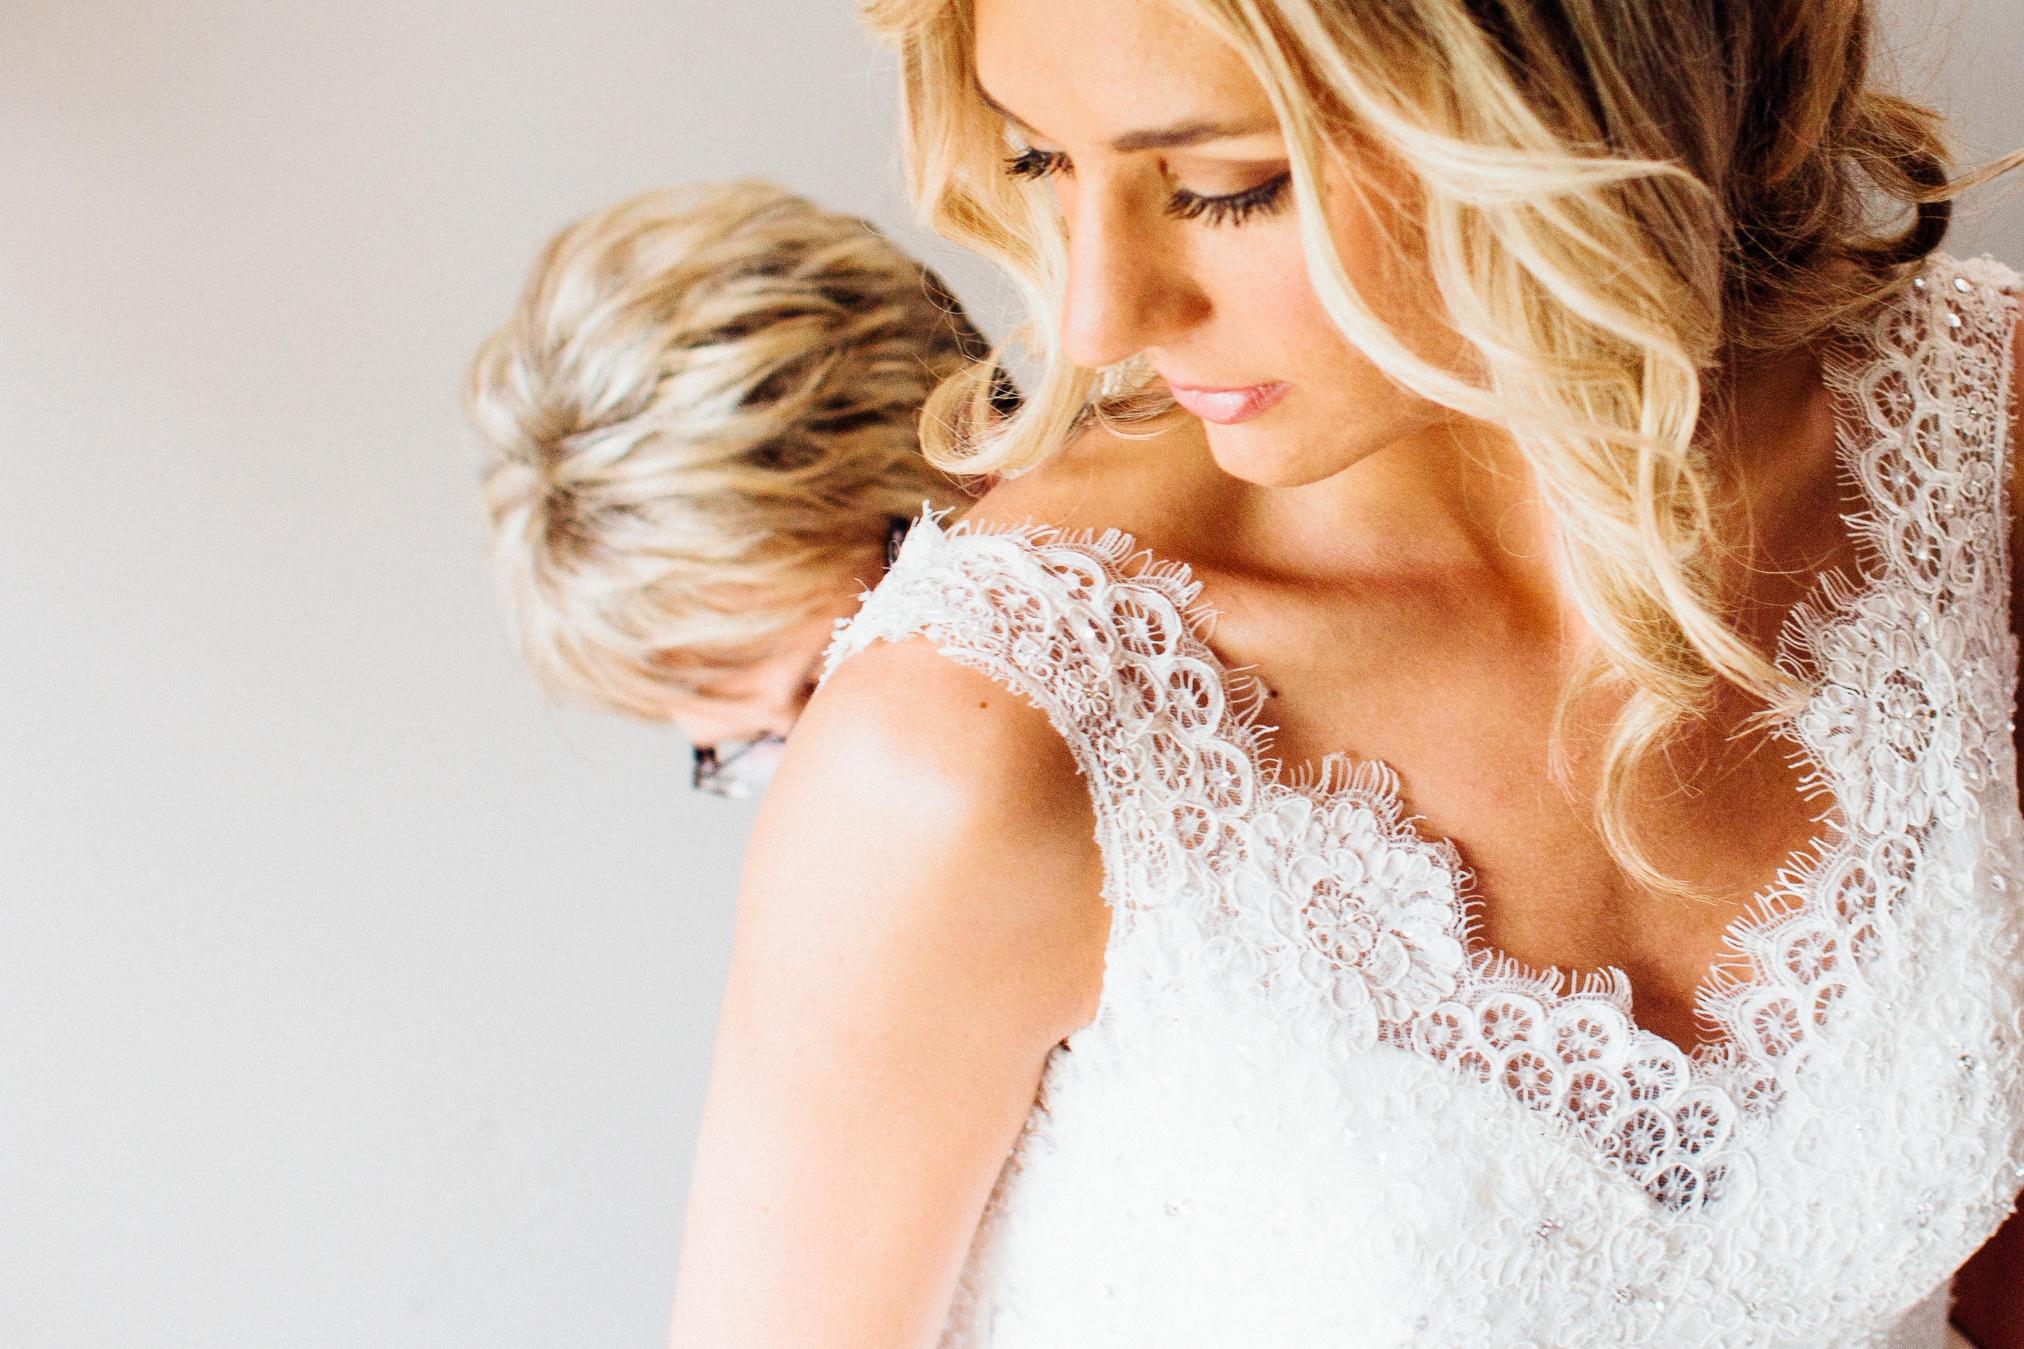 schmid_wedding-57.jpg